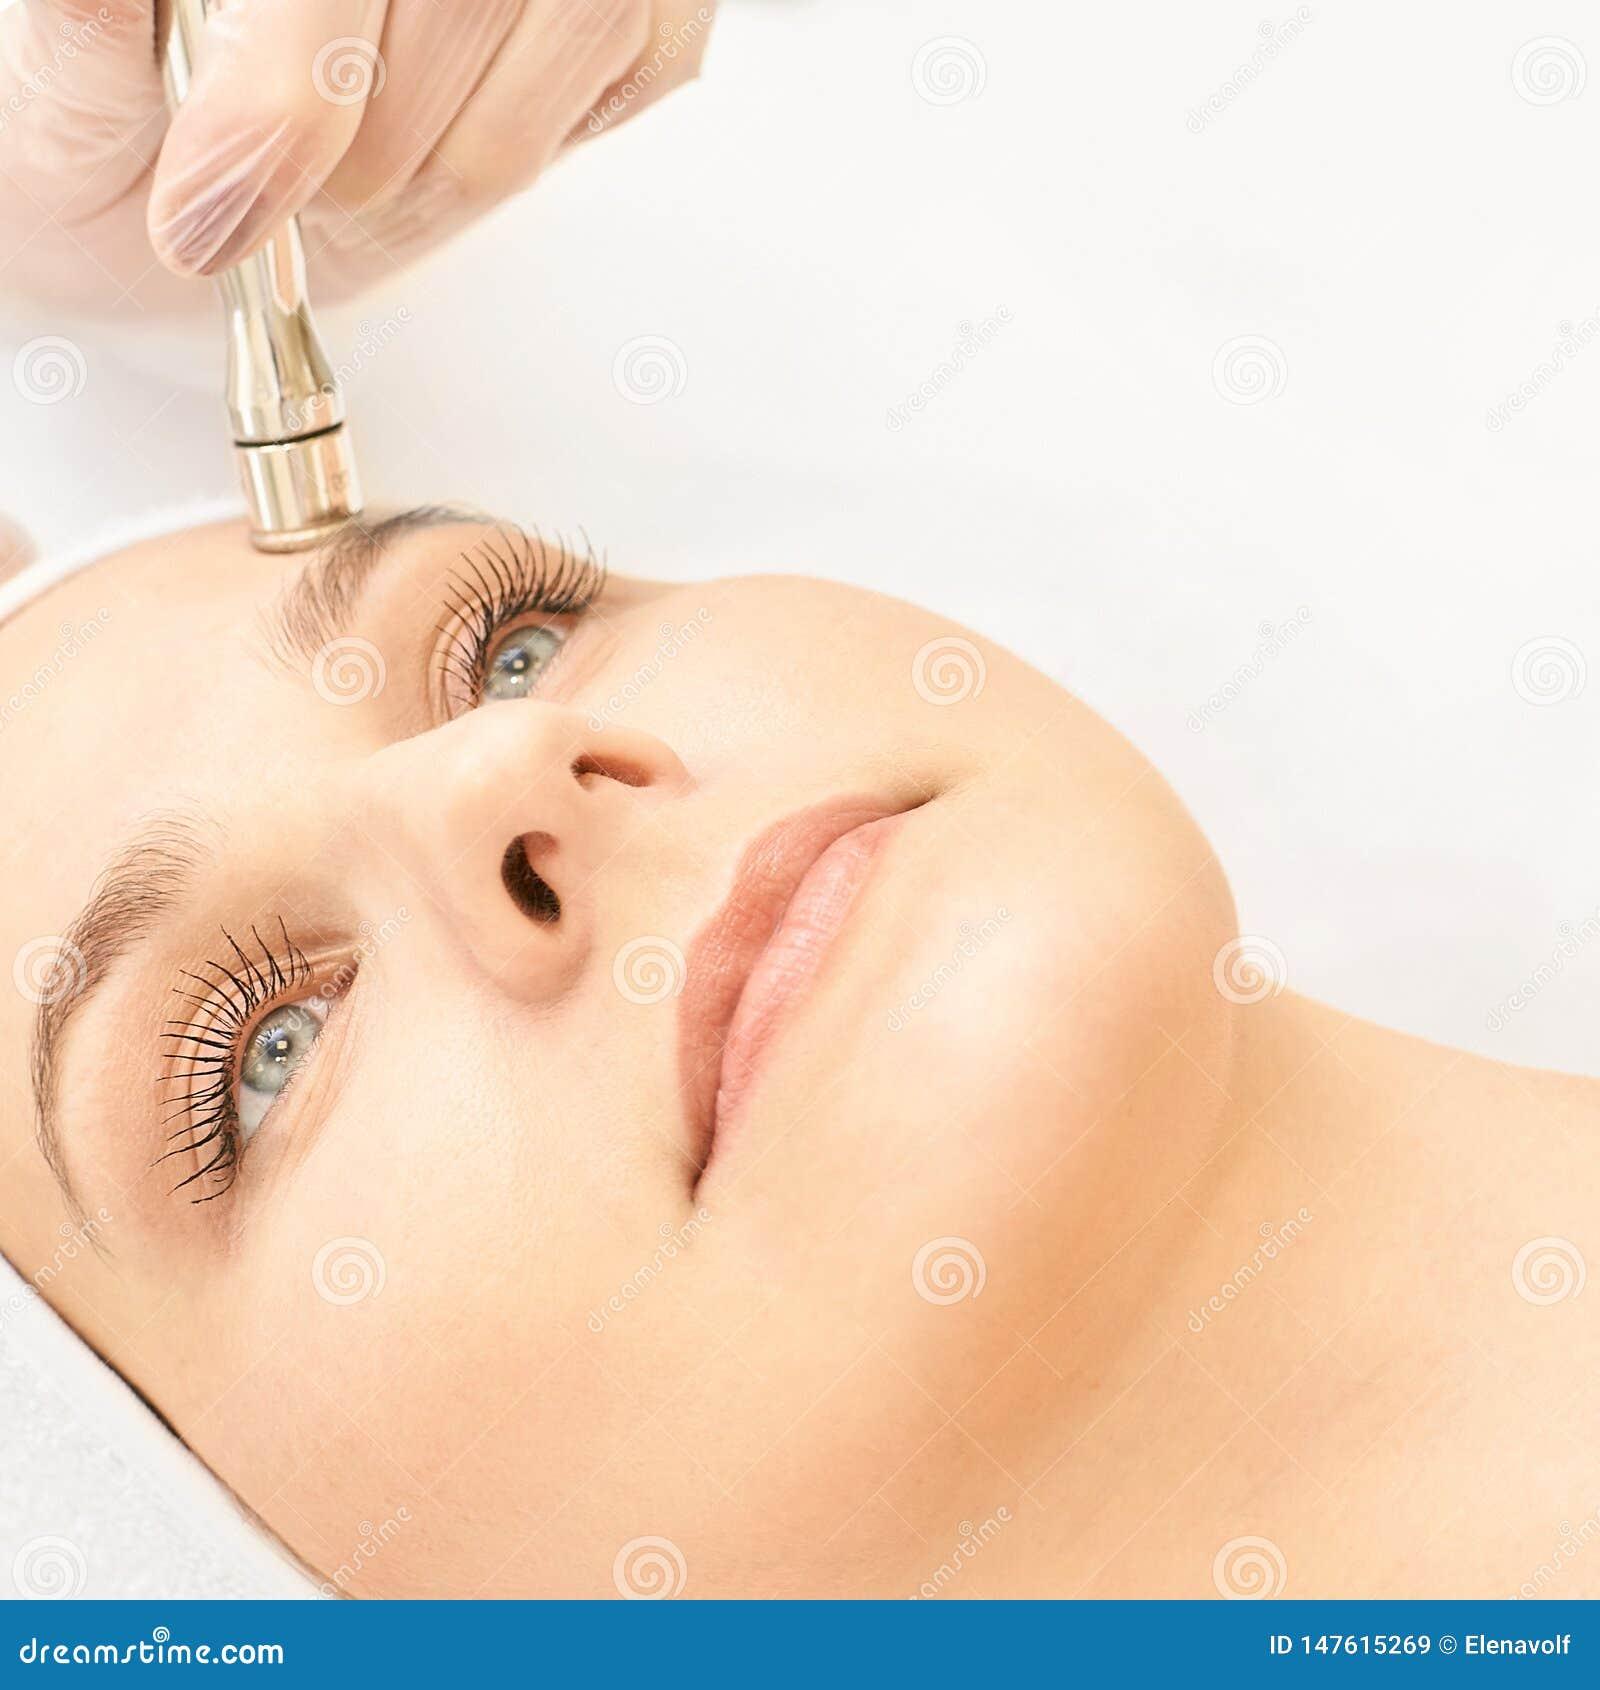 Kosmetologibehandling Barn Salon-kosmetisk maskinvara Hudrengöring med diamantdiameter